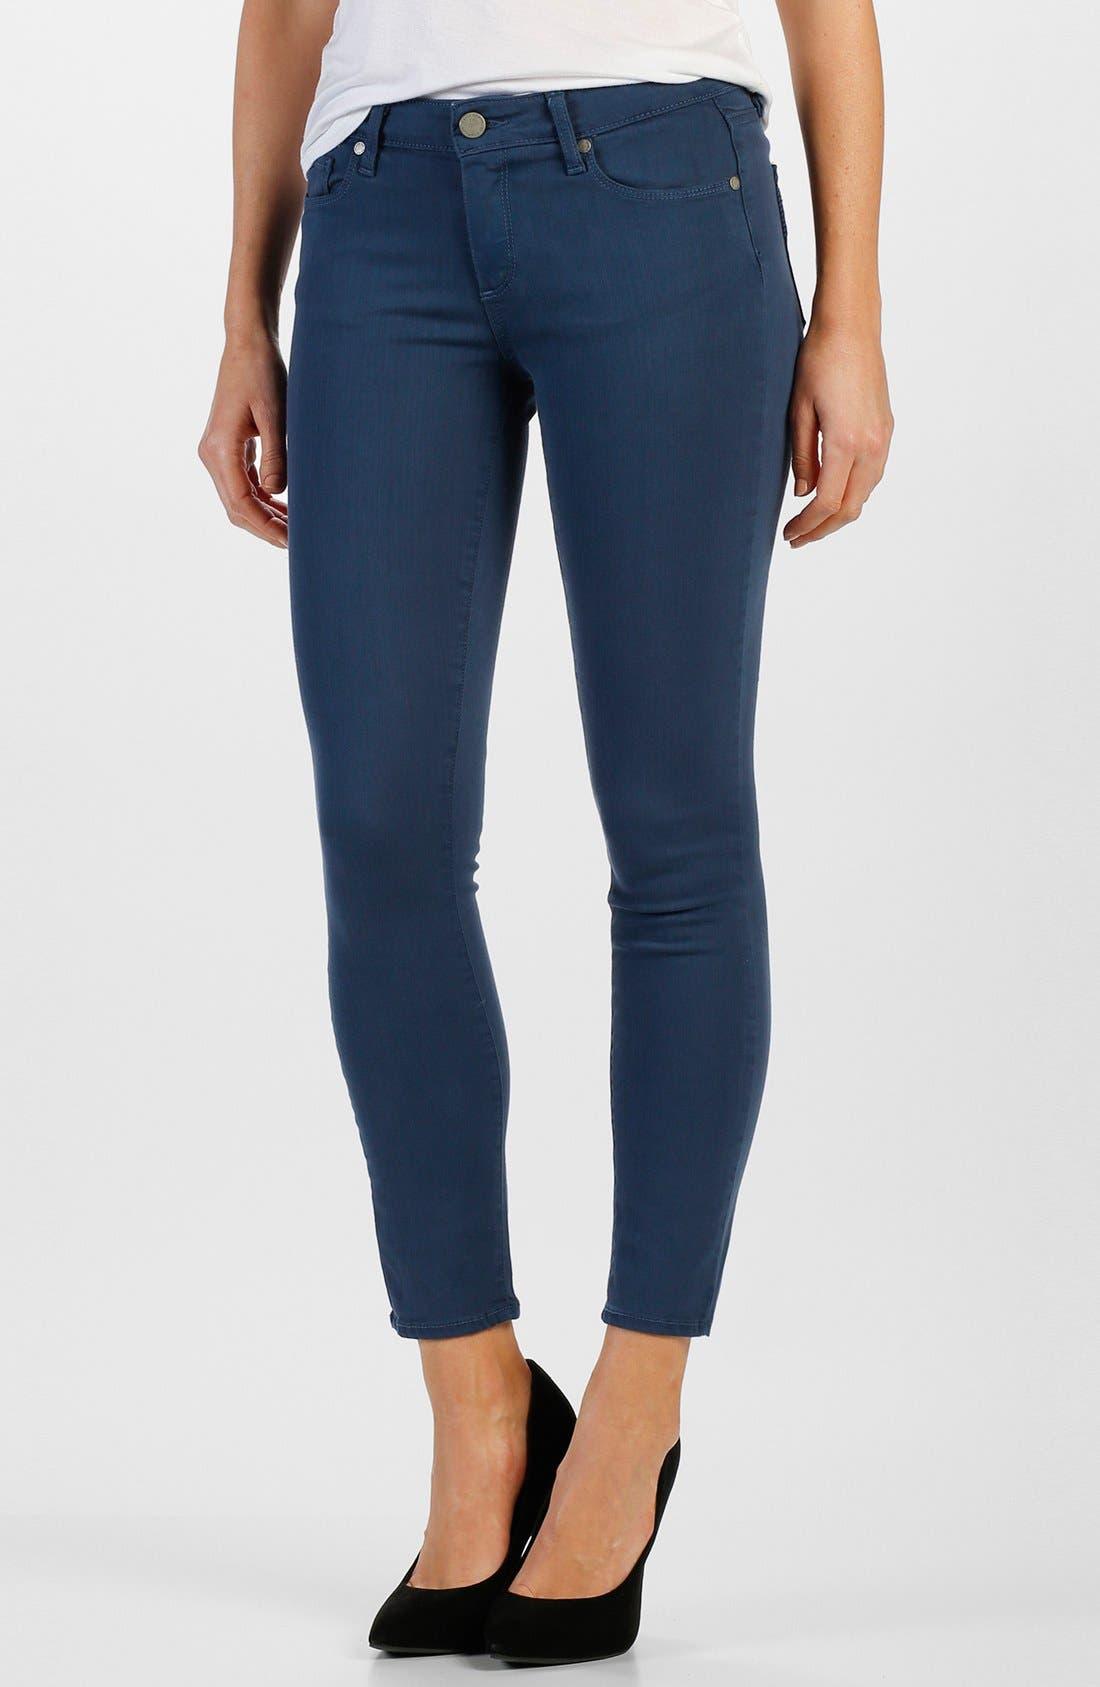 Alternate Image 1 Selected - Paige Denim 'Verdugo' Ankle Ultra Skinny Jeans (Cornflower Blue)